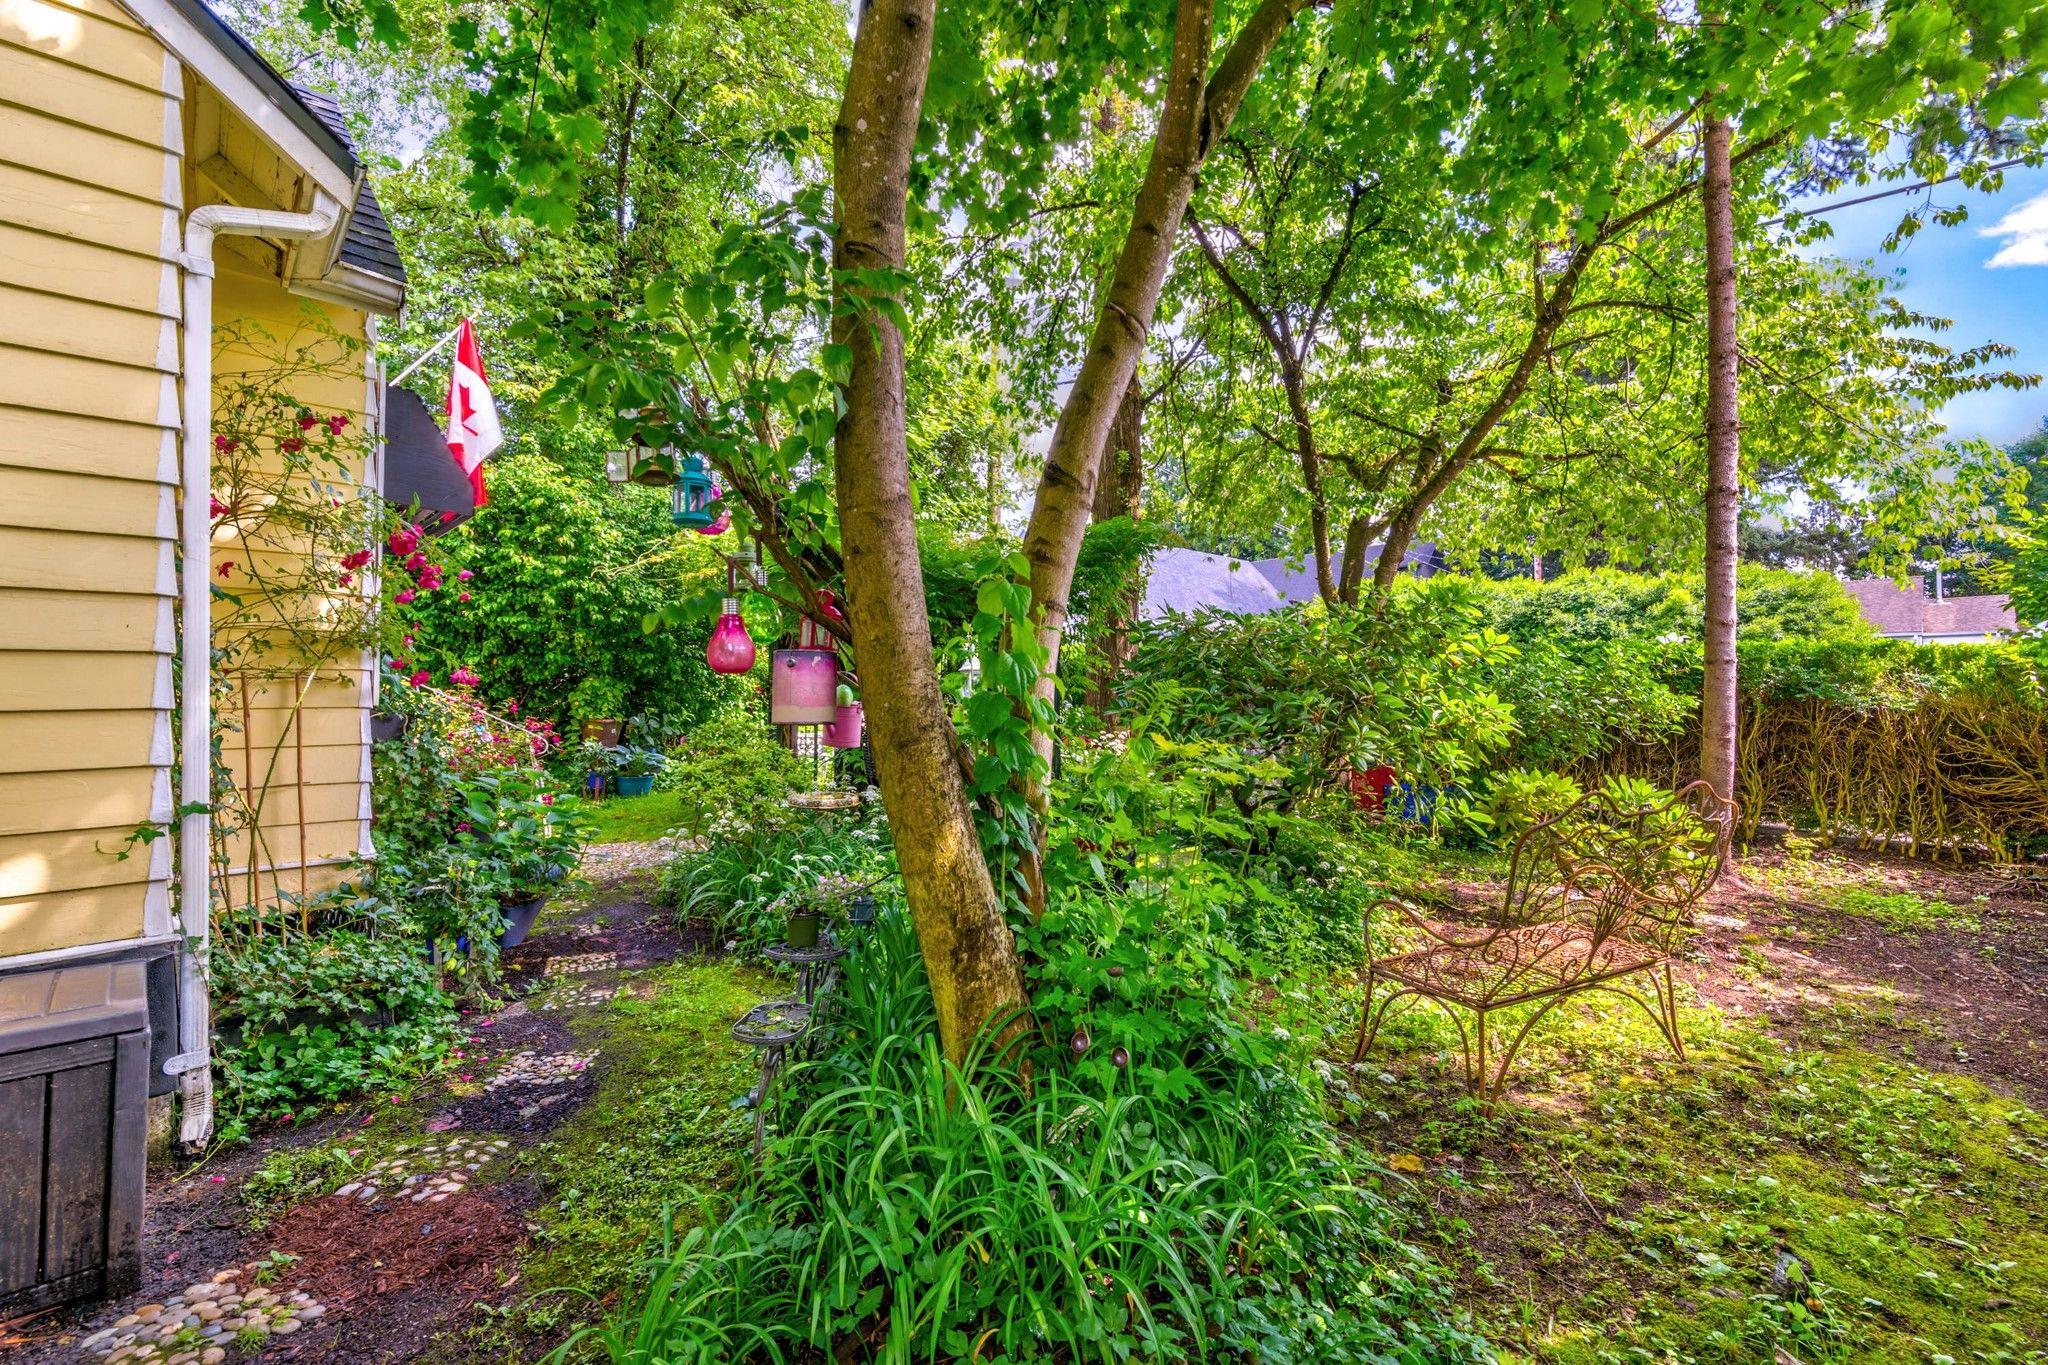 Photo 7: Photos: 20623 114 Avenue in Maple Ridge: Southwest Maple Ridge House for sale : MLS®# R2465656